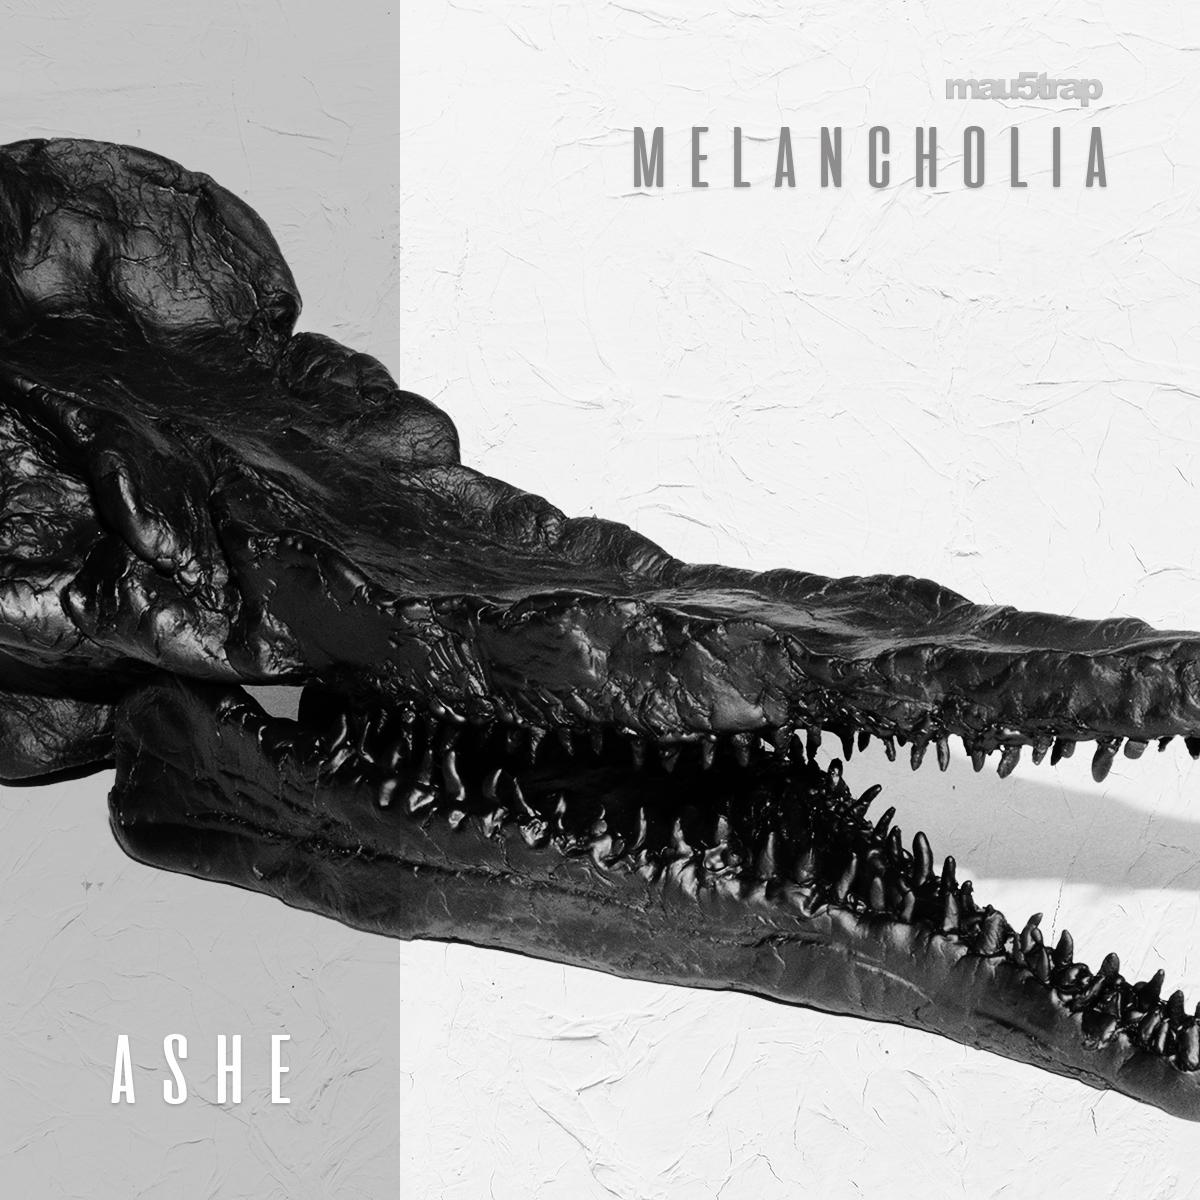 ASHE - Melancholia EP